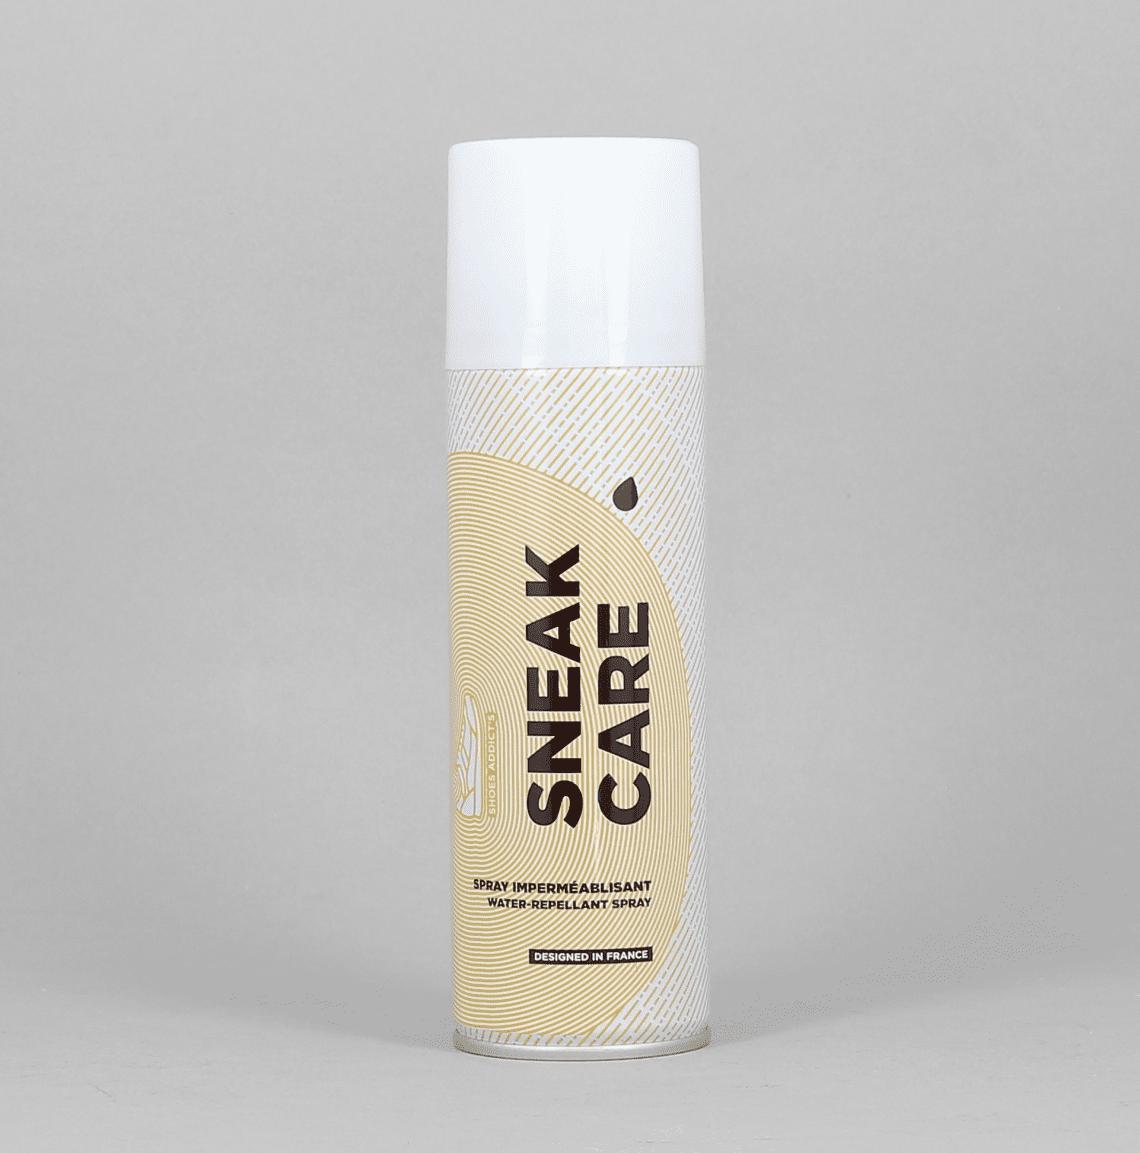 sneak care spray